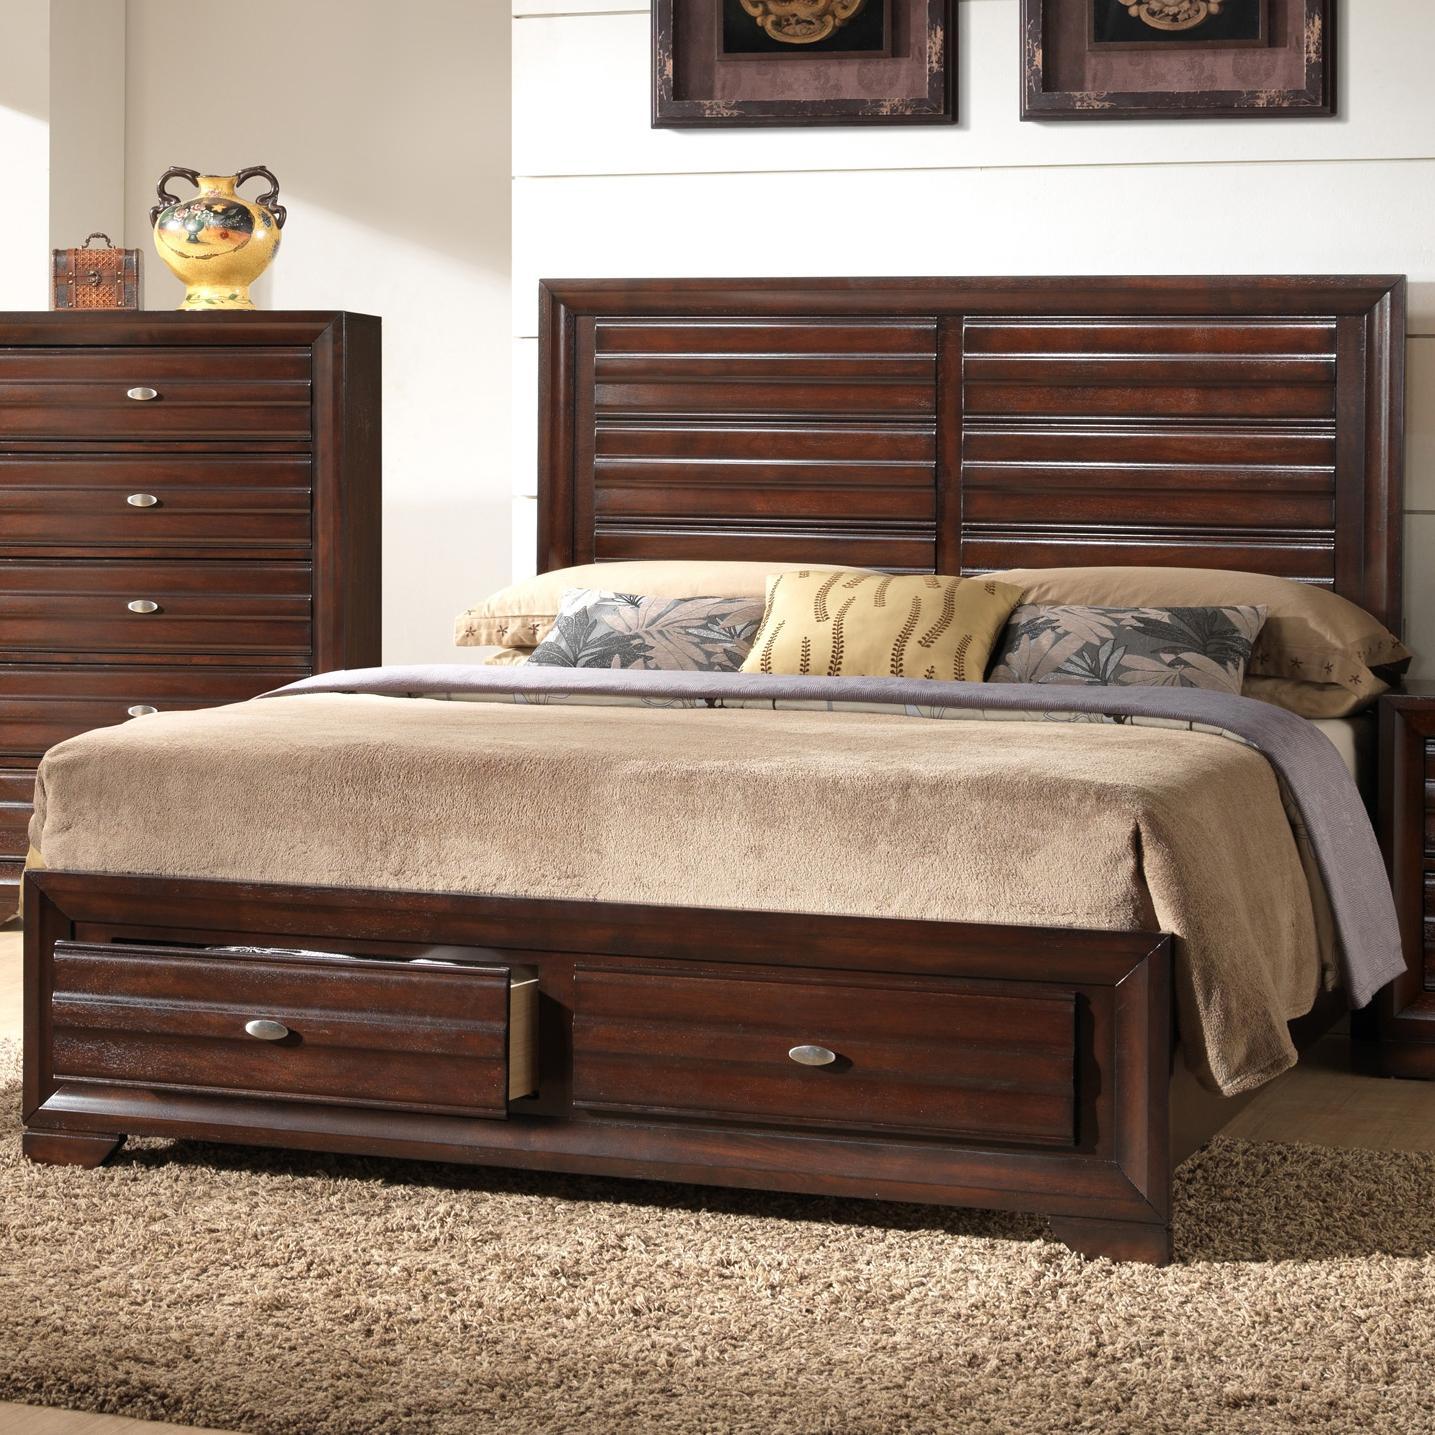 Crown Mark Stella King Storage Headboard Footboard Bed Del Sol Furniture Panel Beds